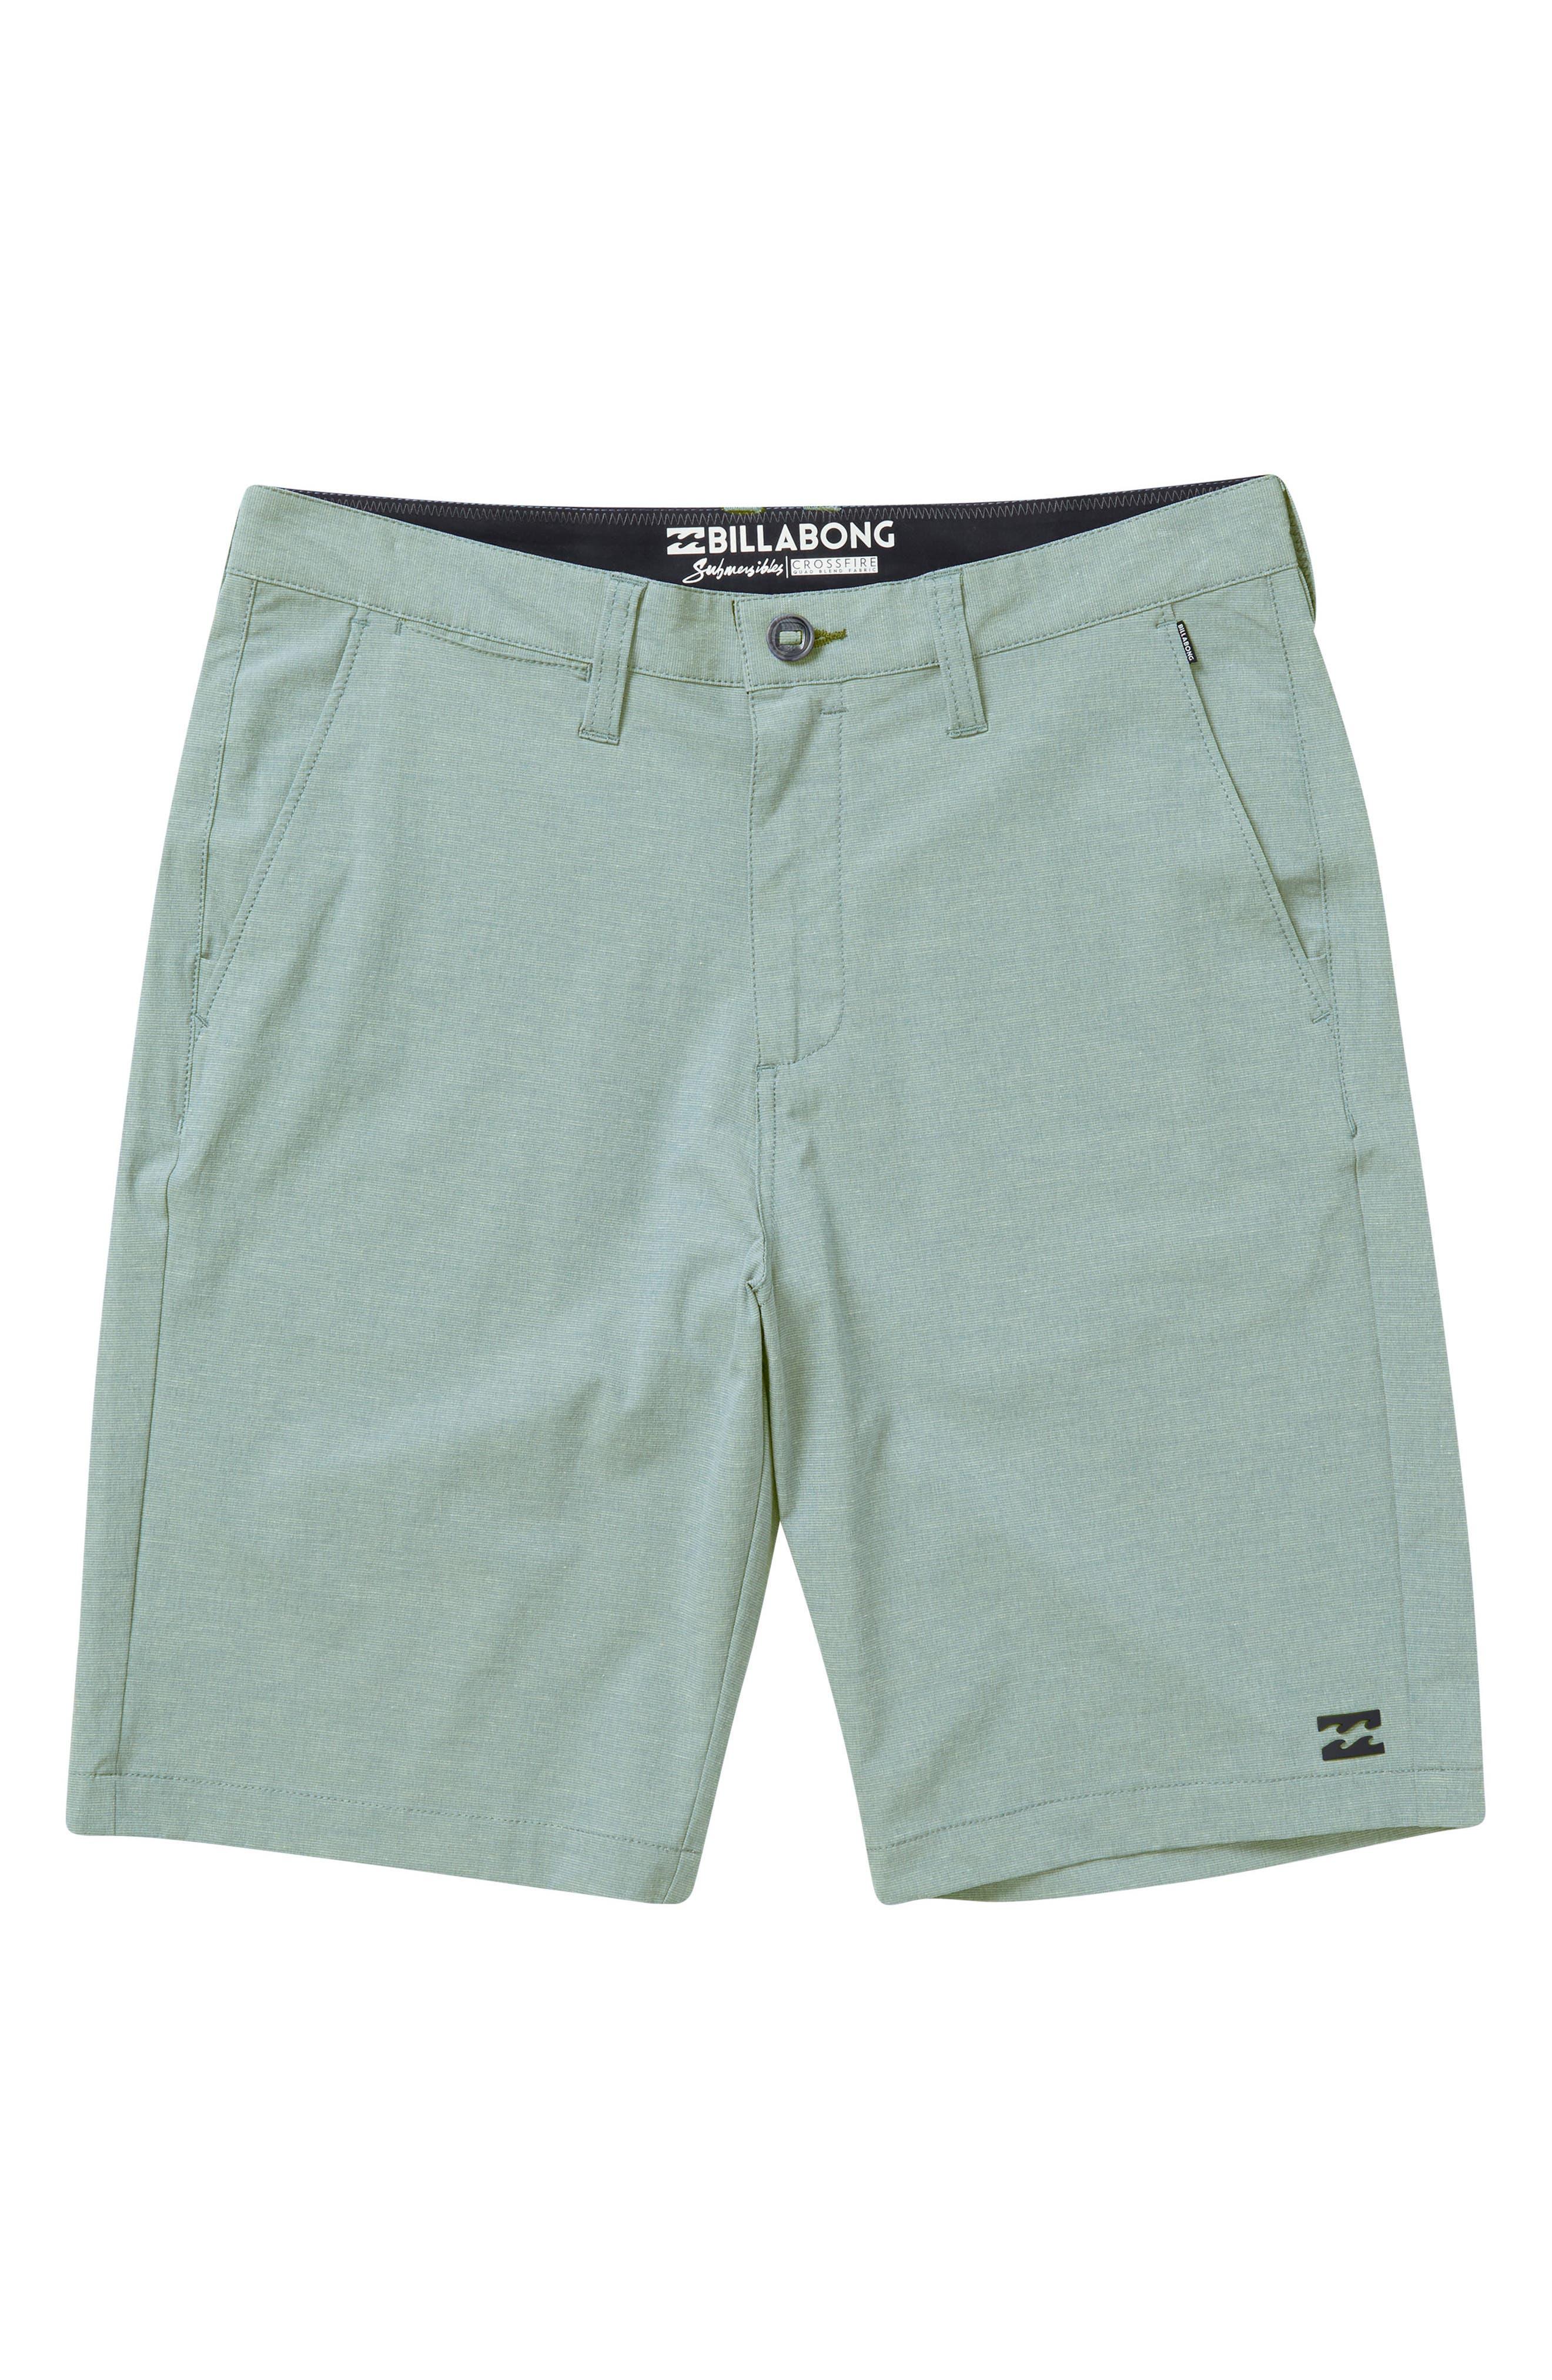 Crossfire X Hybrid Shorts,                             Main thumbnail 1, color,                             Dusty Blue